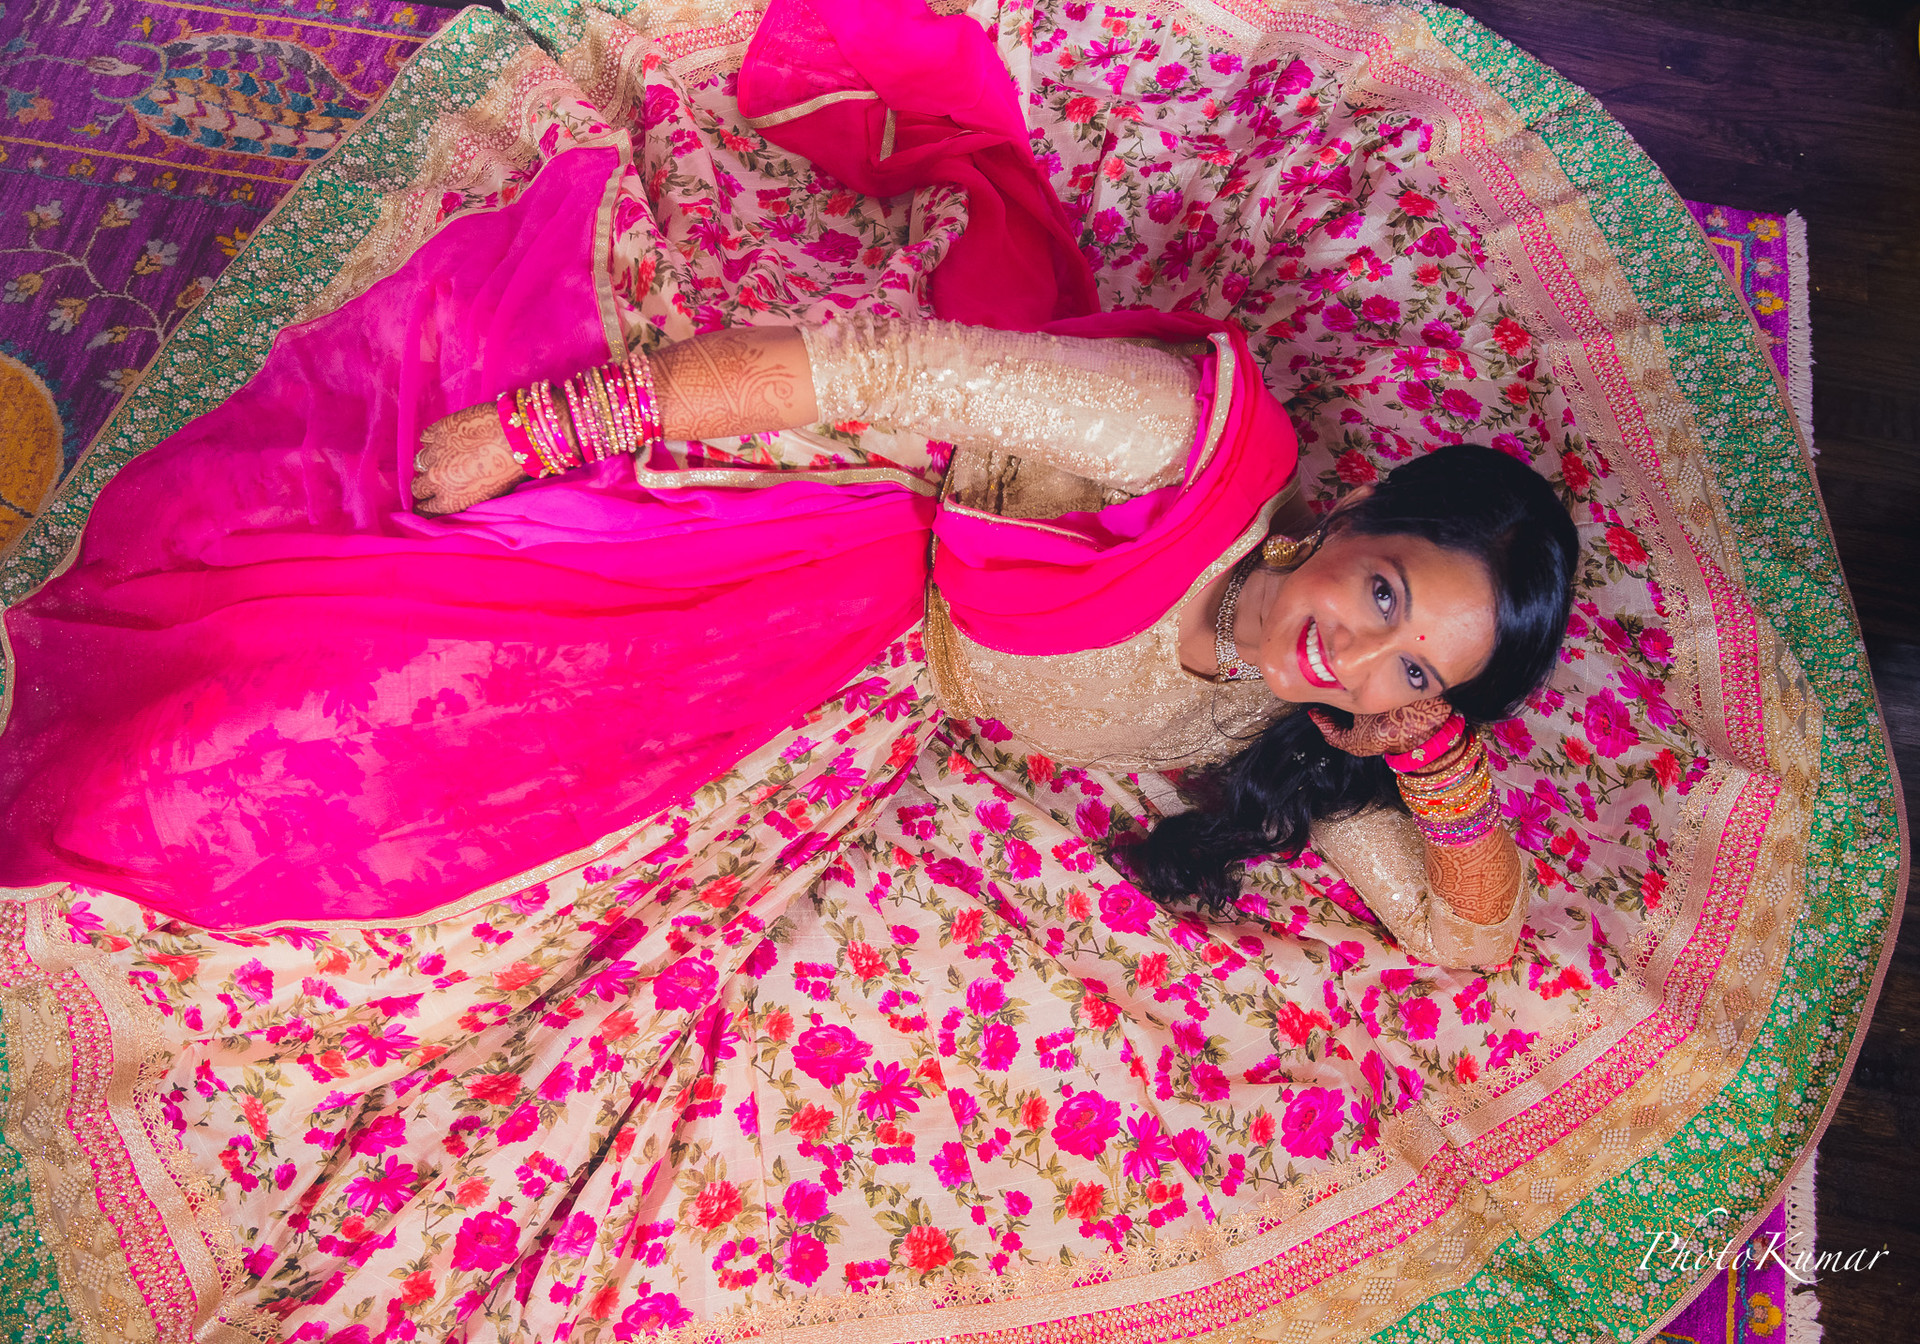 South Indain Bride in her beautiful wedding dress.